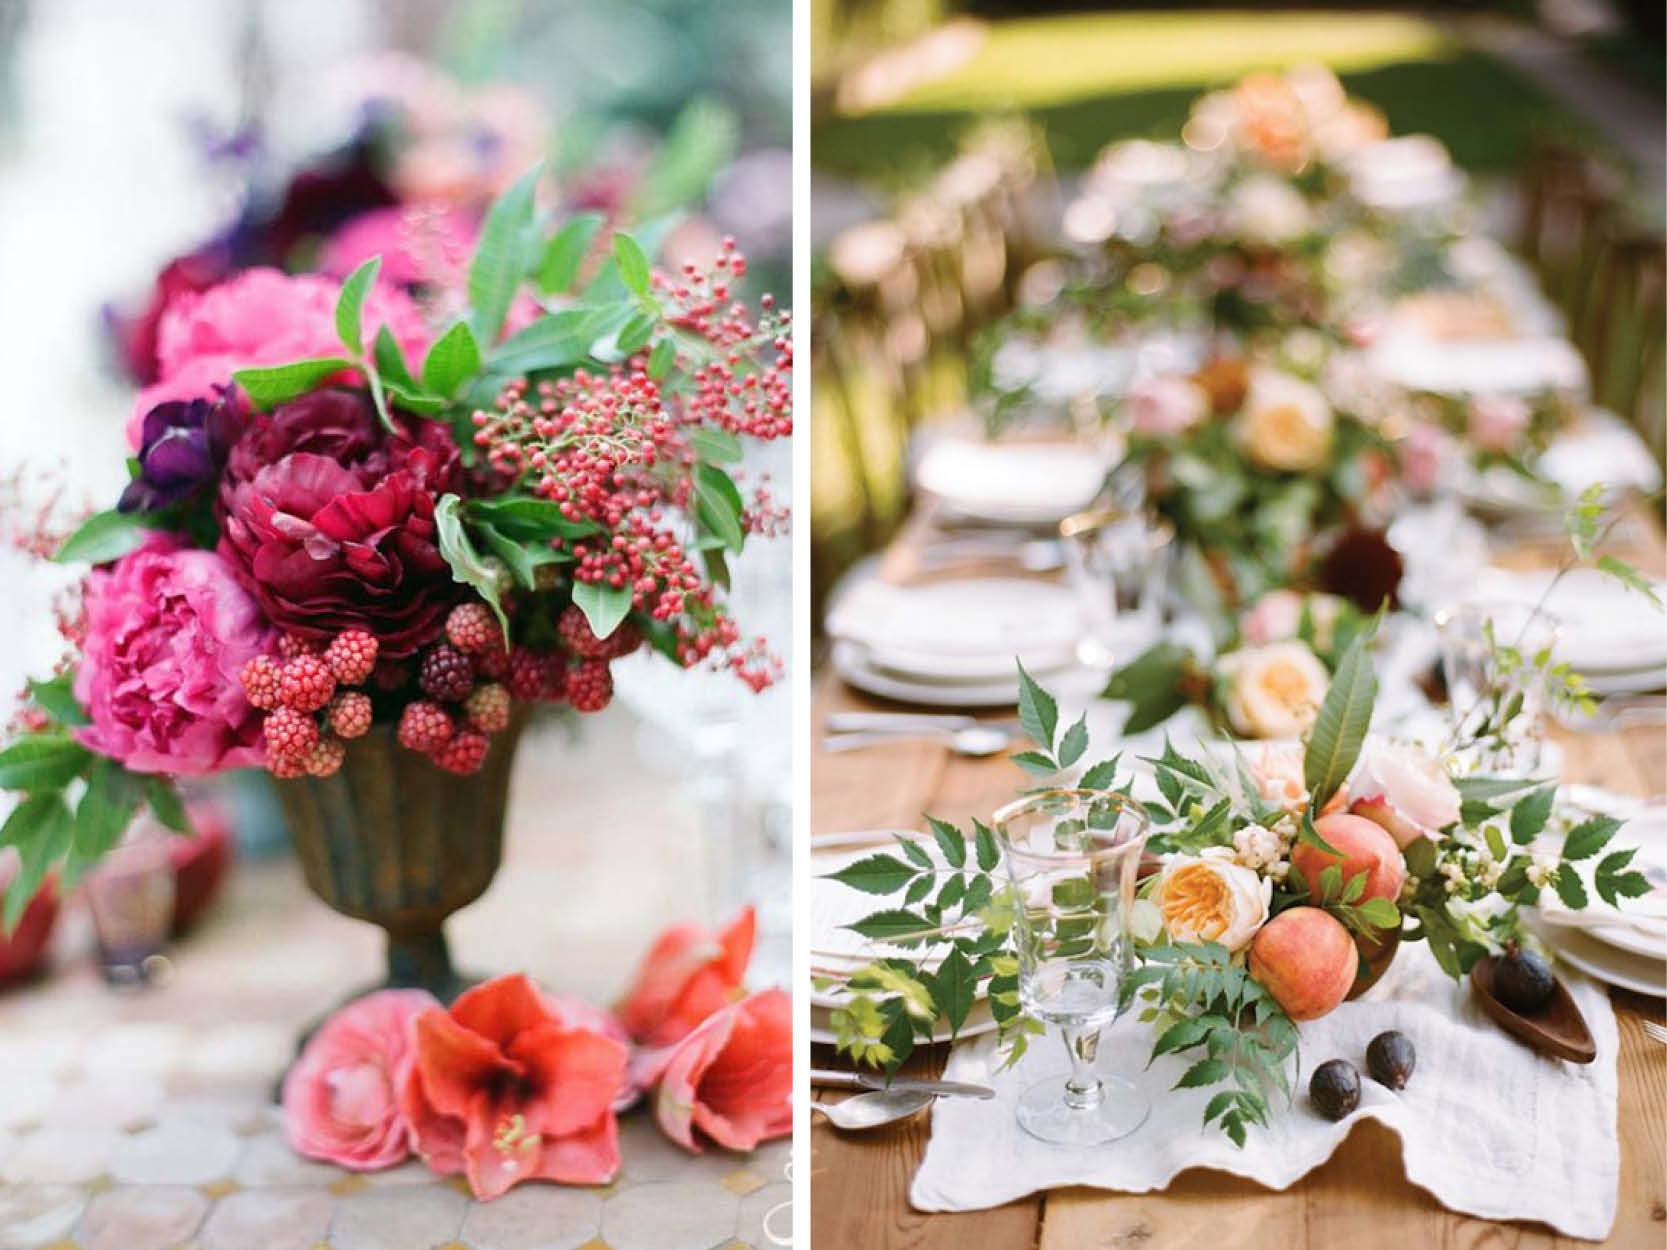 Top 28 ideias de decora o para casamento ao ar livre - Decorar bar barato ...